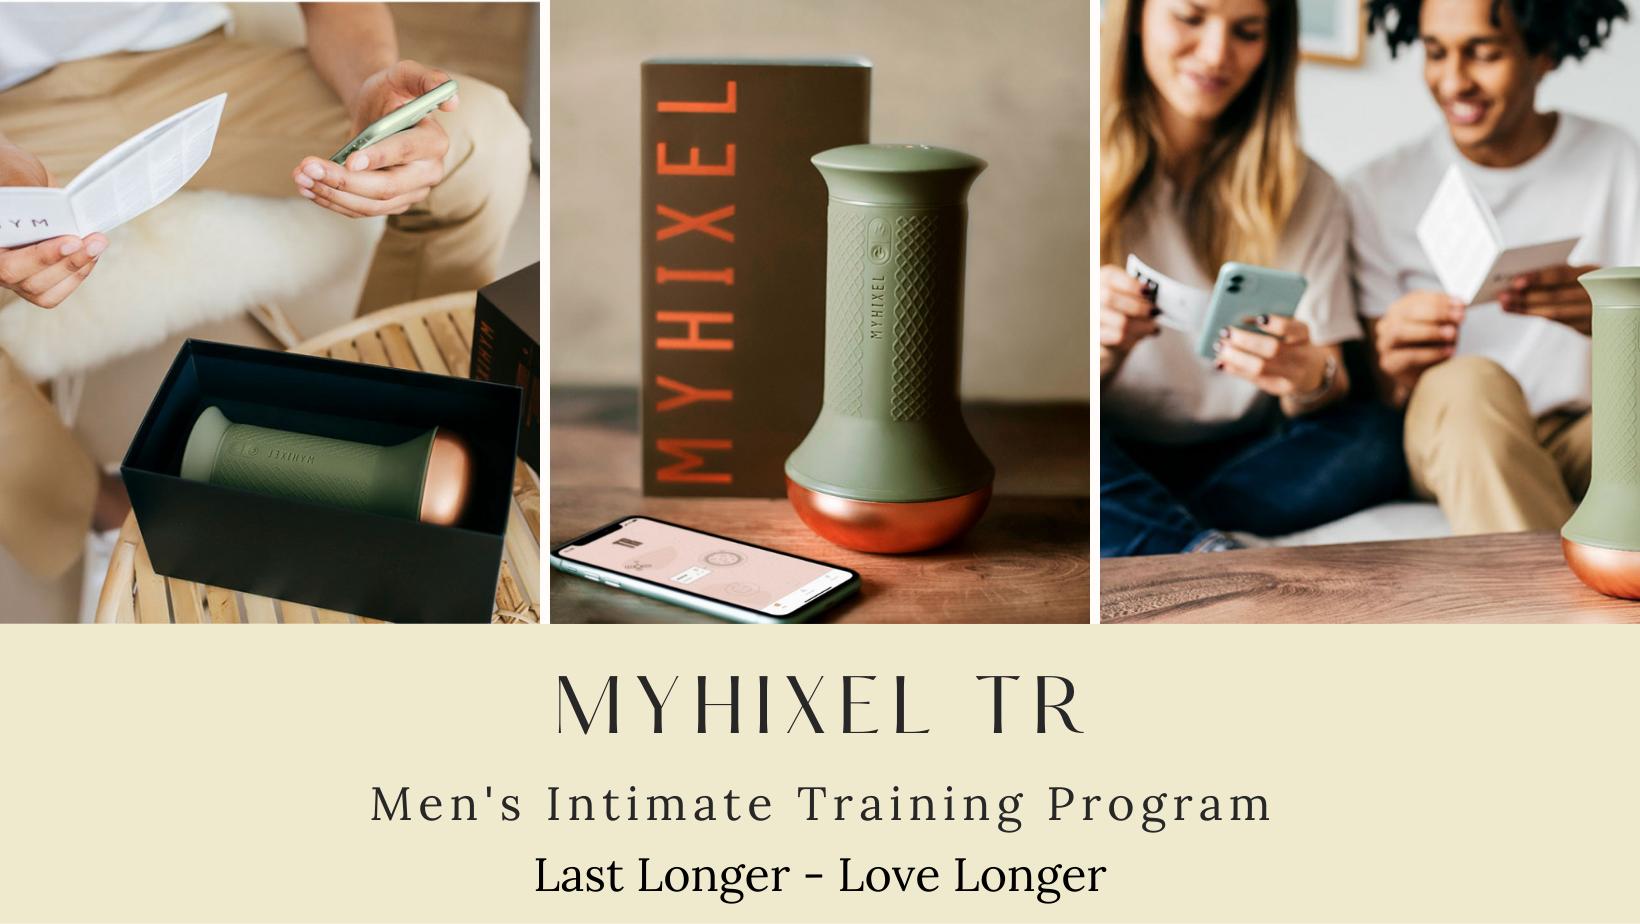 Myhexel tr, men's, masturbation, training, last longer, prolong, masturbation, couples